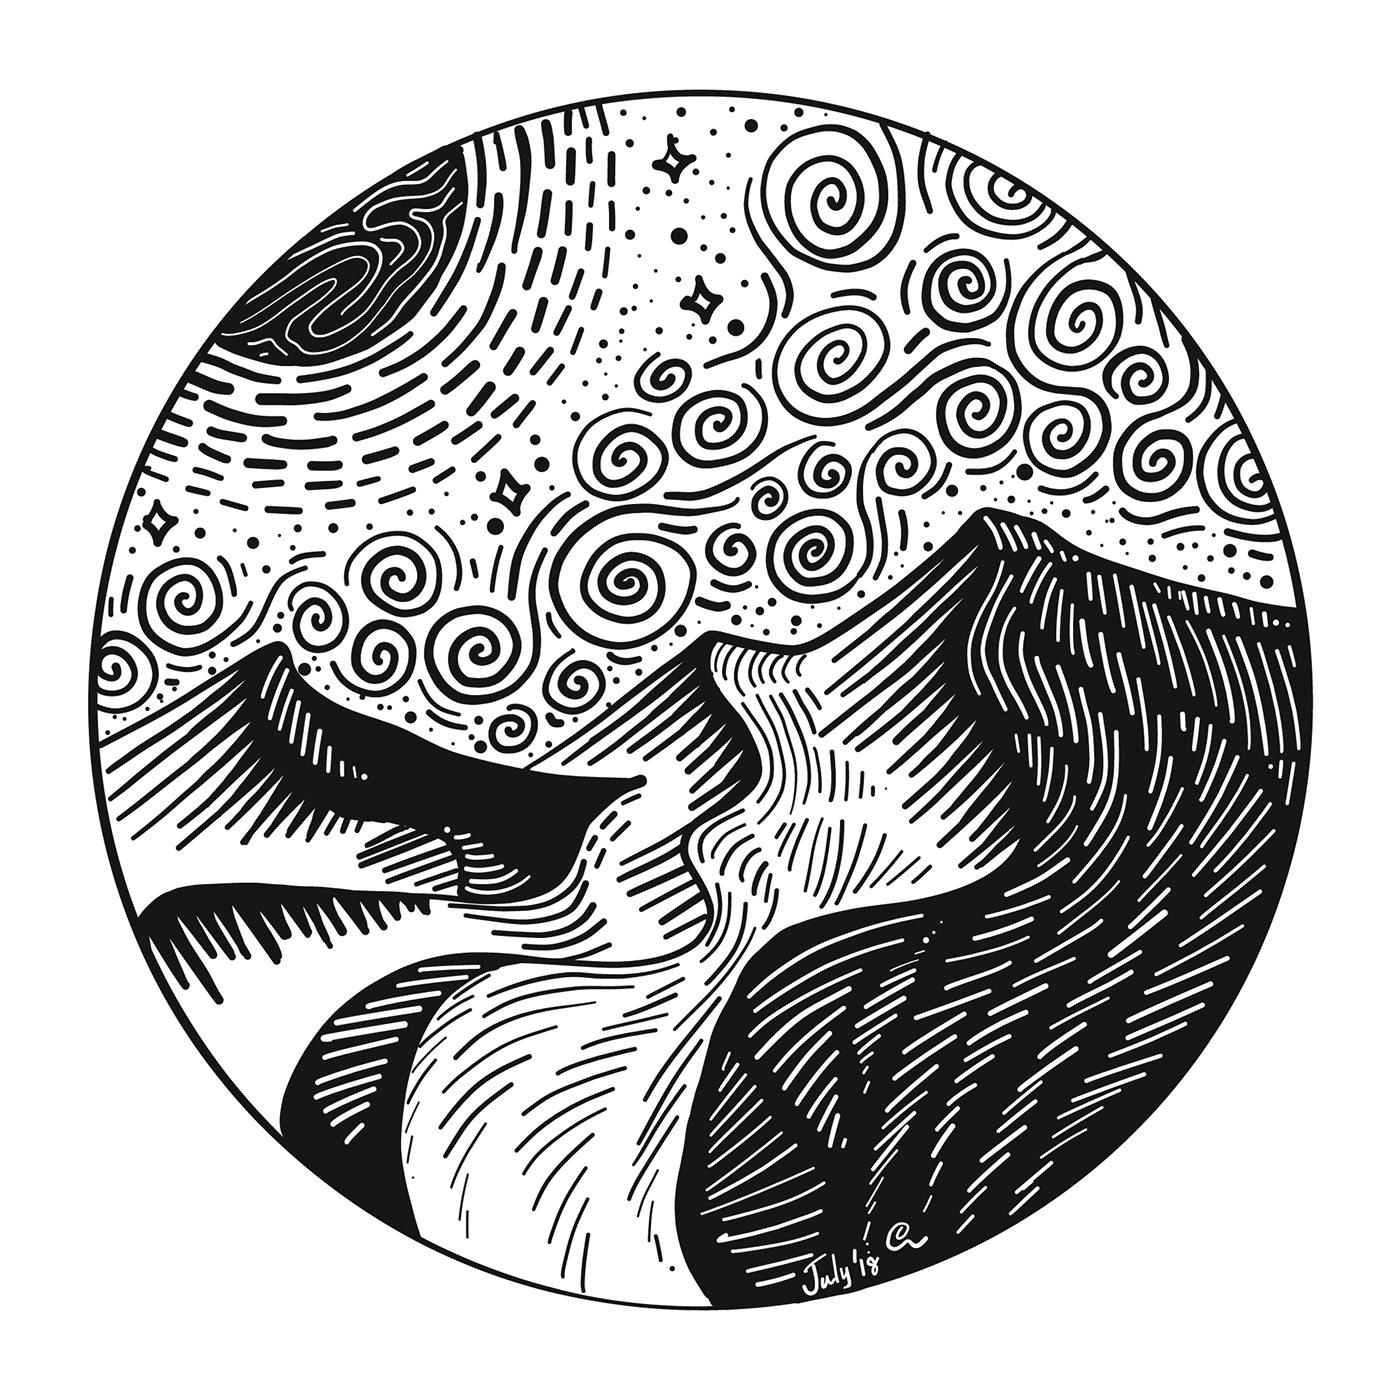 Line Art Series | Doodle Art on Behance